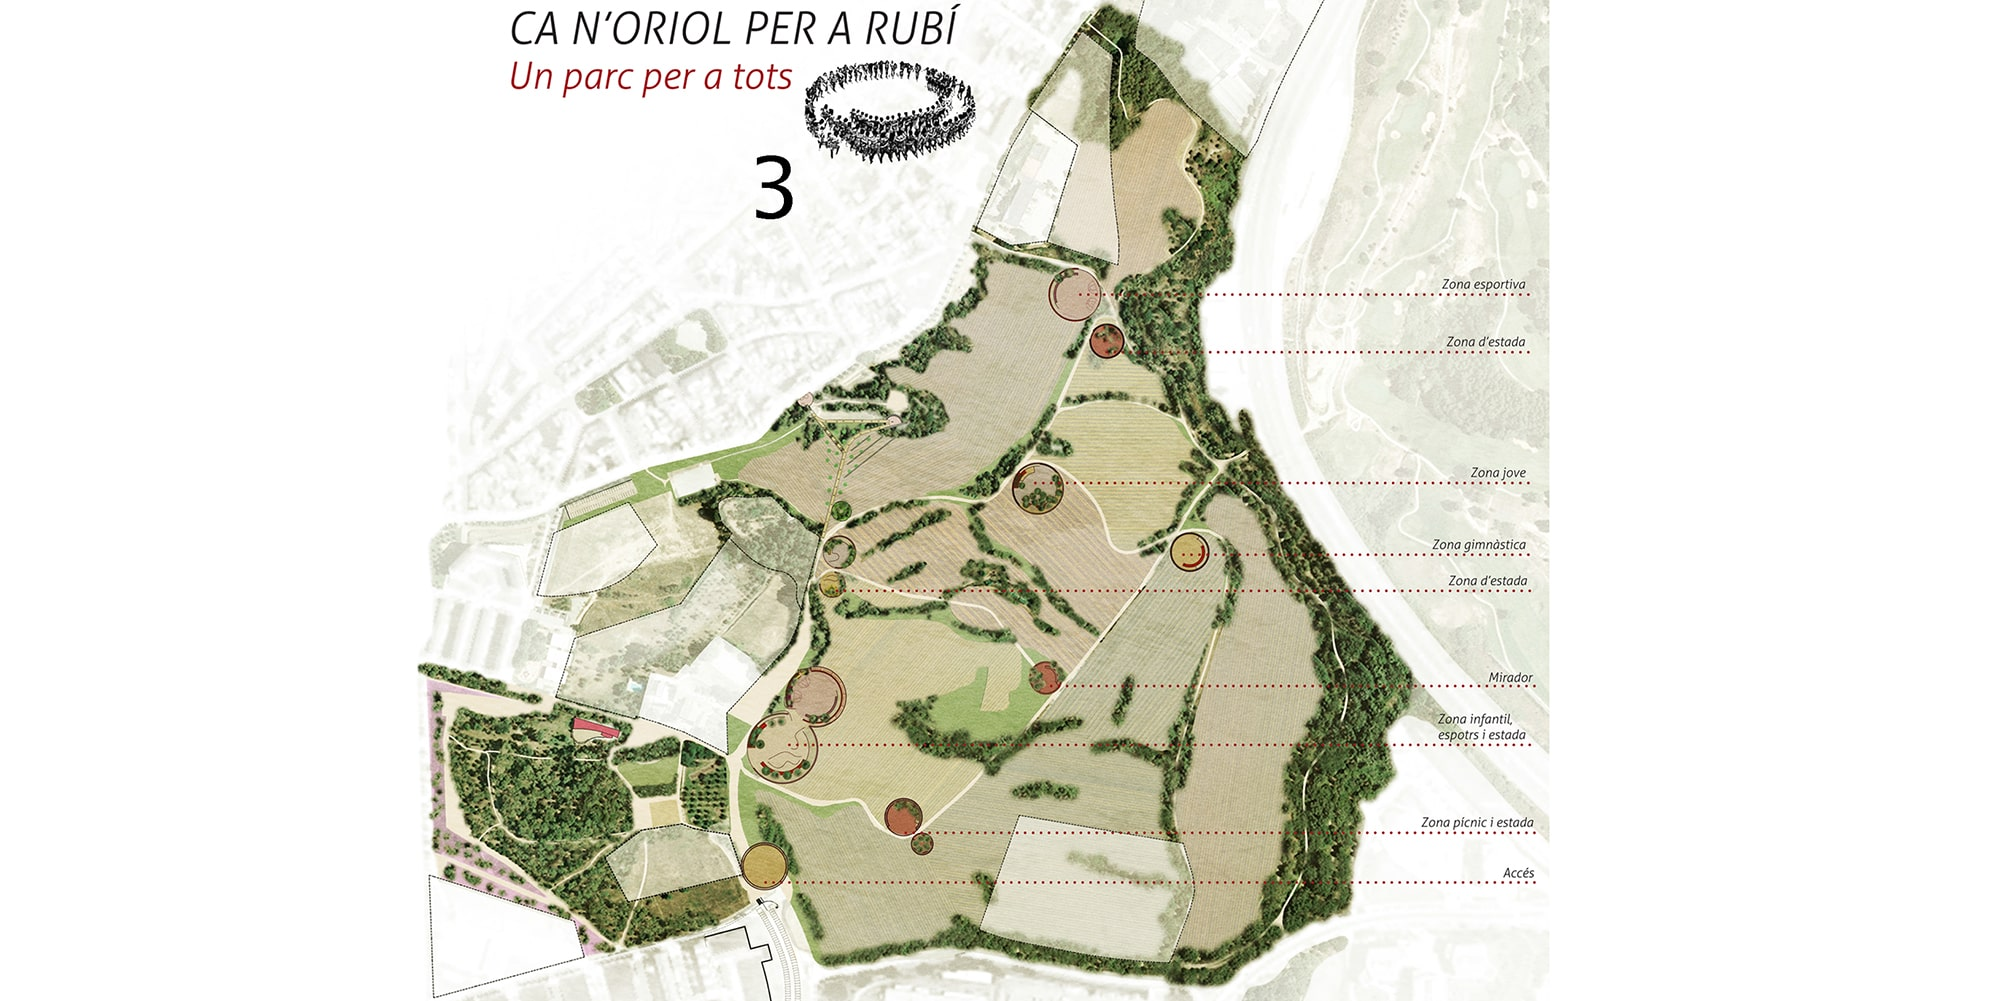 Parc de Ca n'Oriol